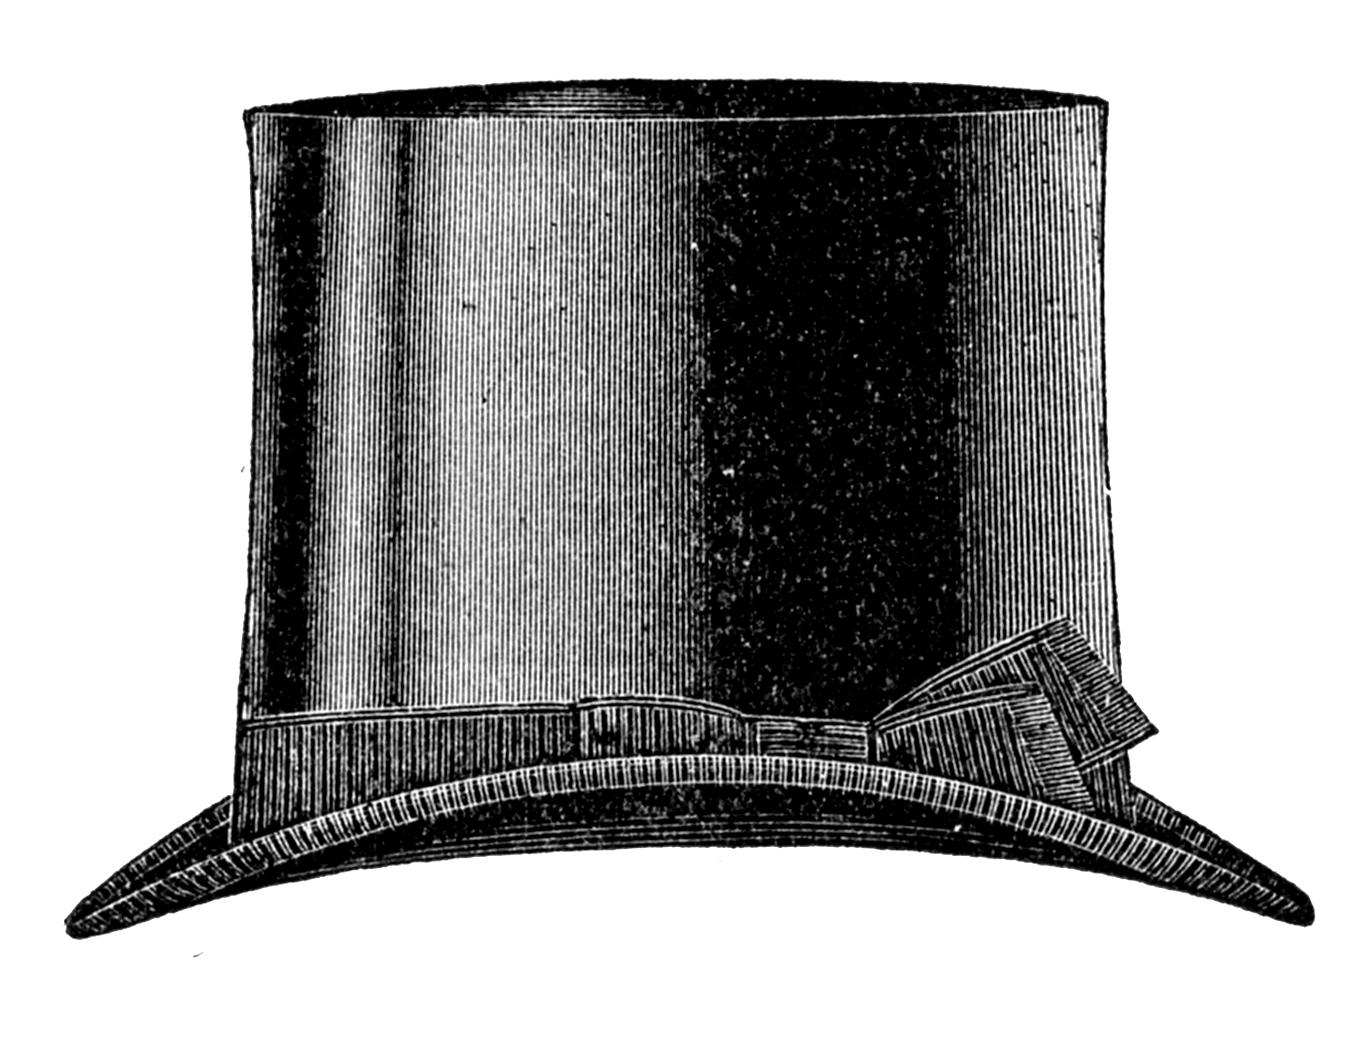 Vintage Clip Art u2013 Menu0027s Hats u2013 Derby u0026 Top Hat